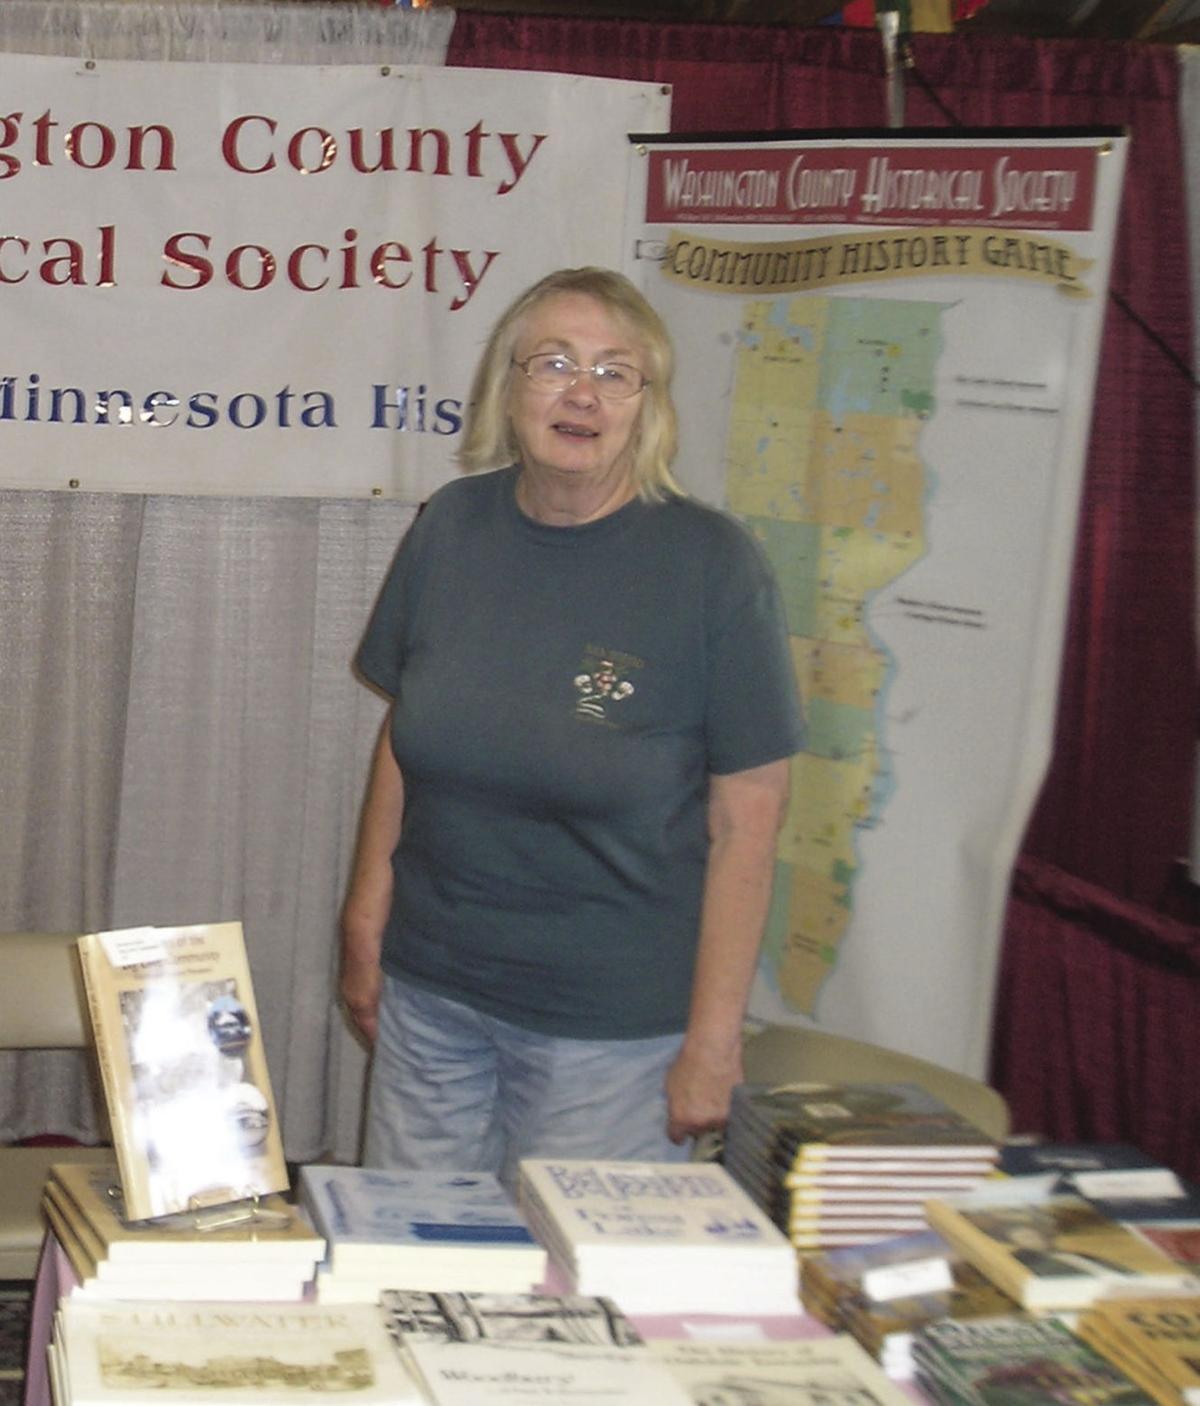 Goodman Nancy at the County Fair.jpg